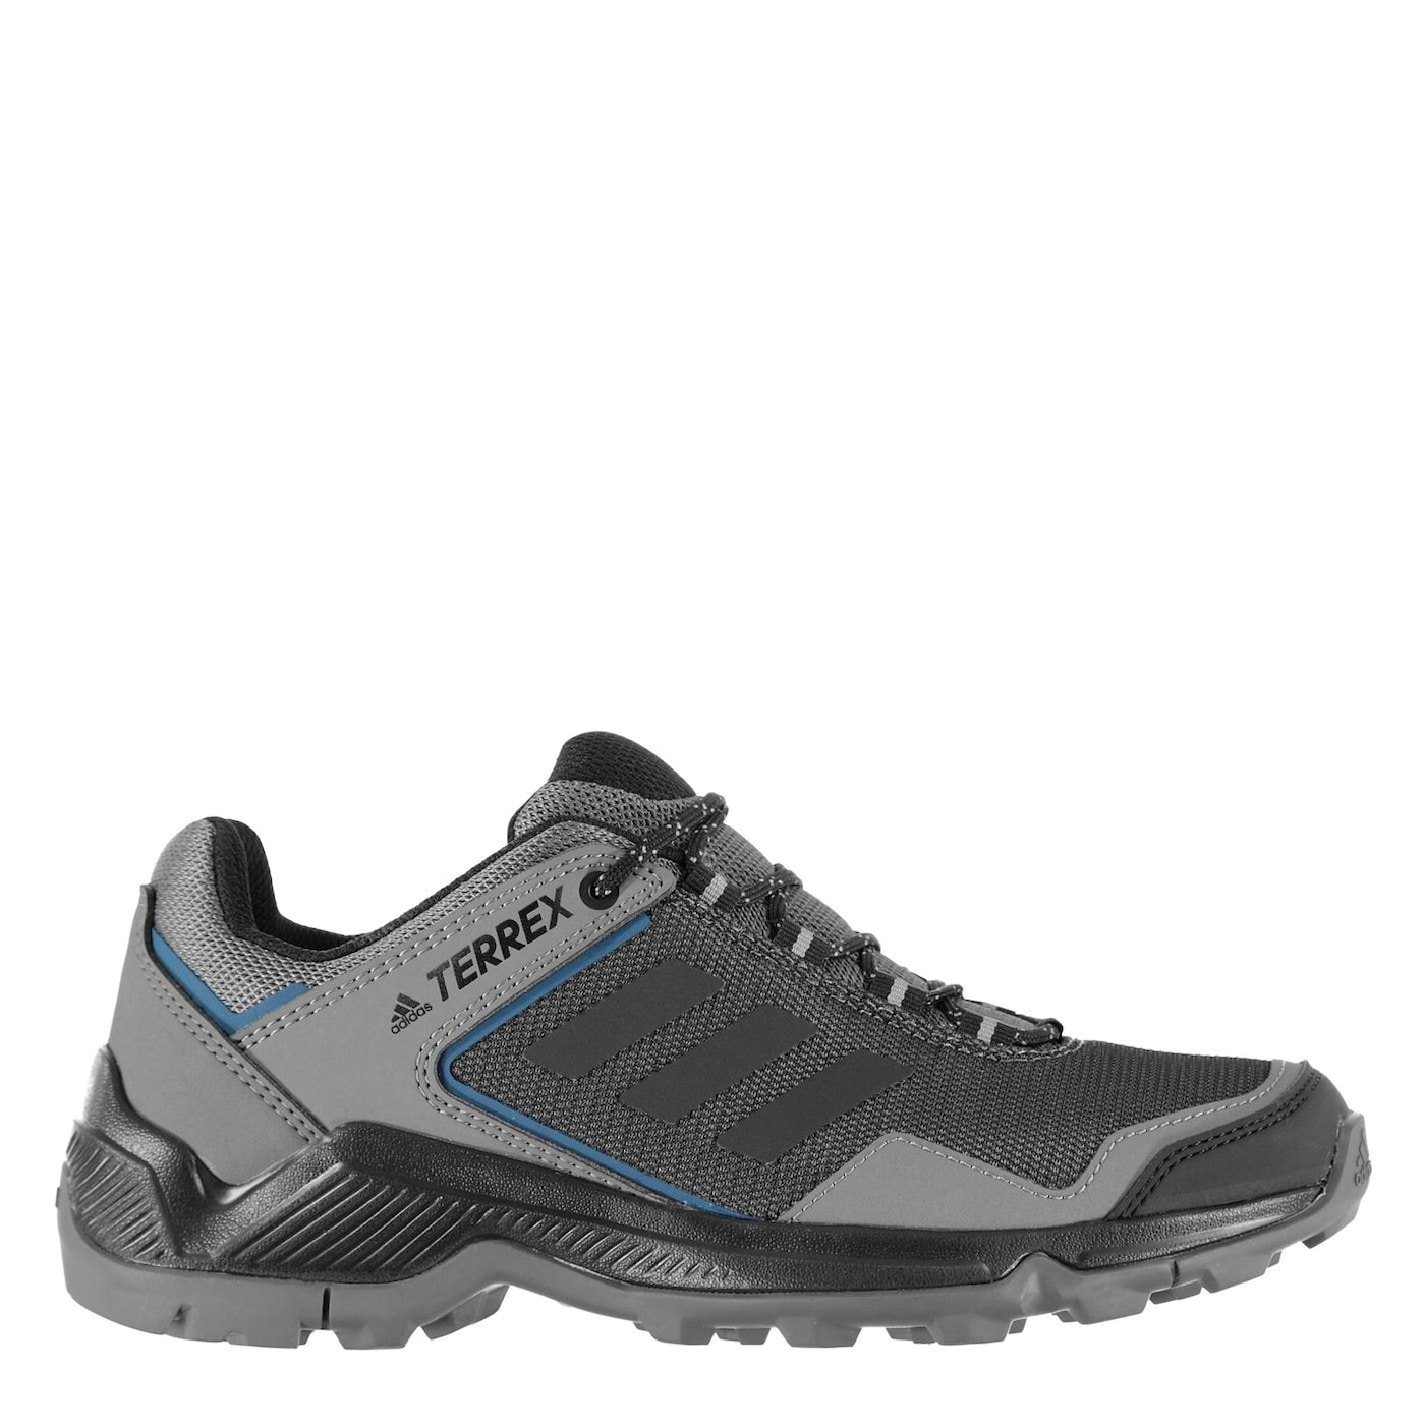 Adidas Terrex Eastrail Mens Hiking Shoes